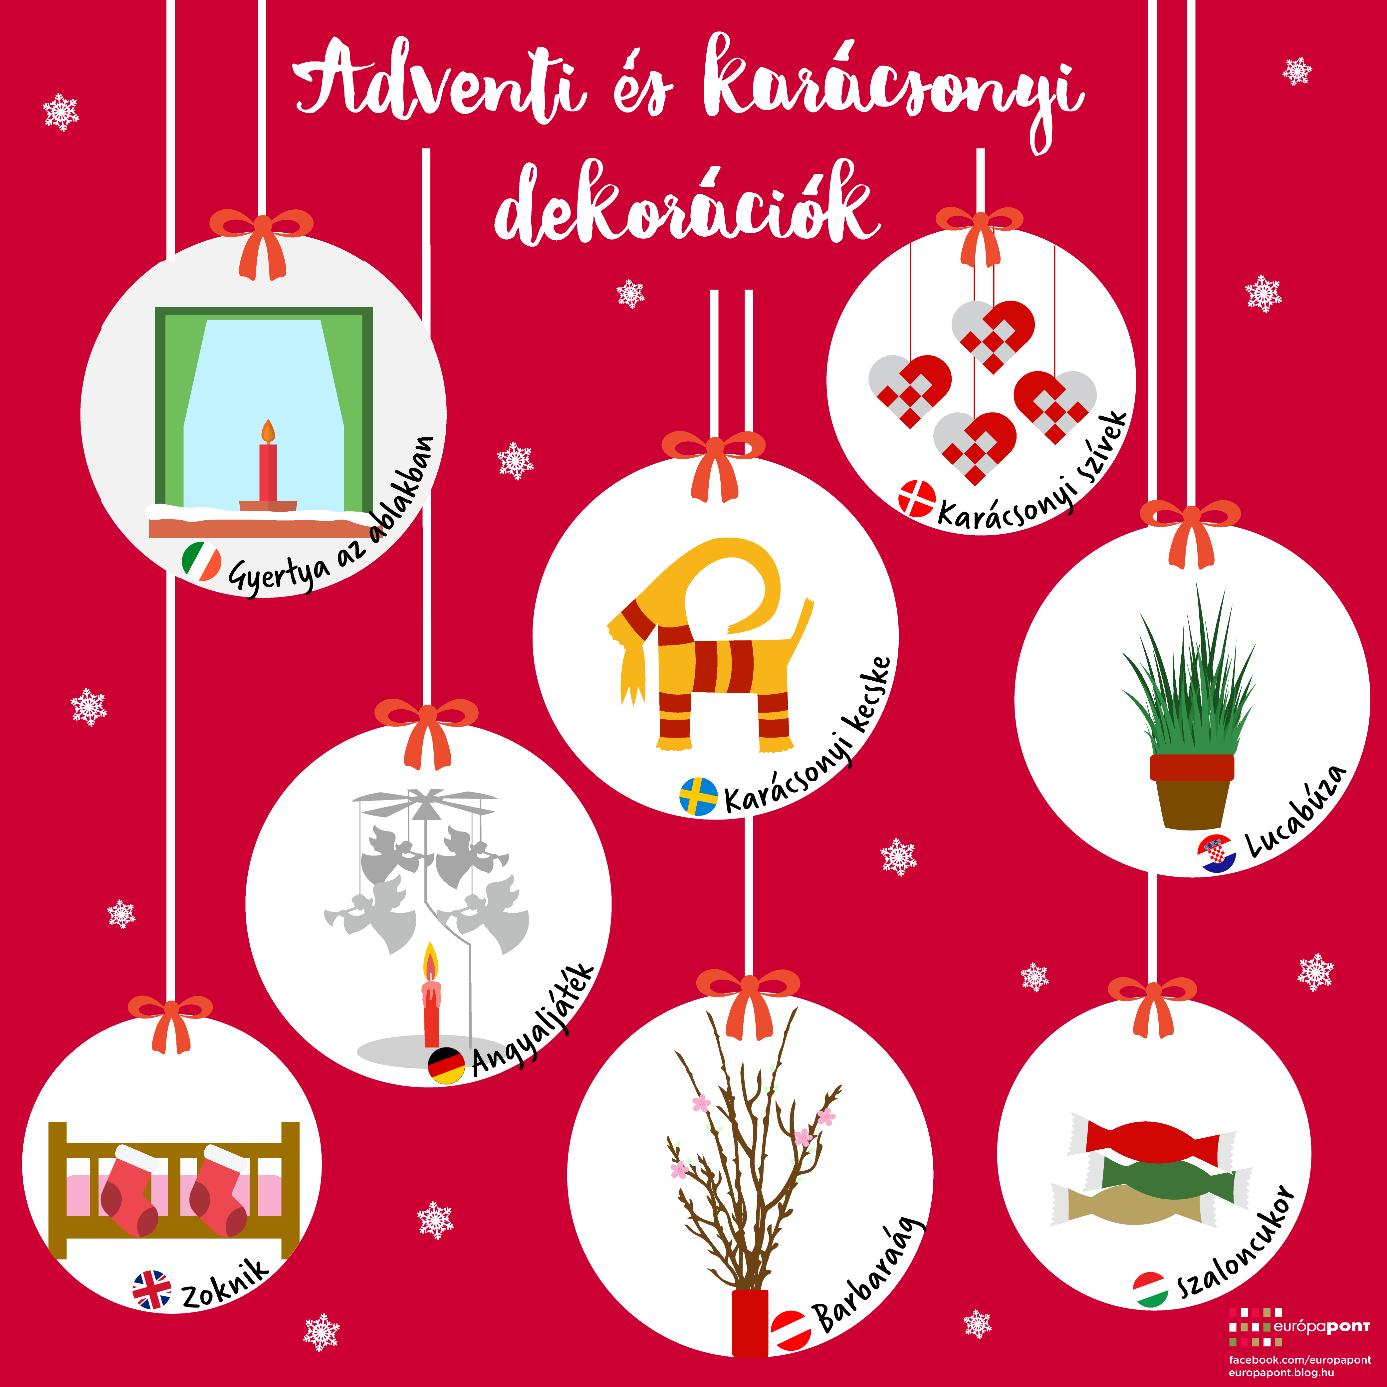 karacsonyi_dekoracio.png